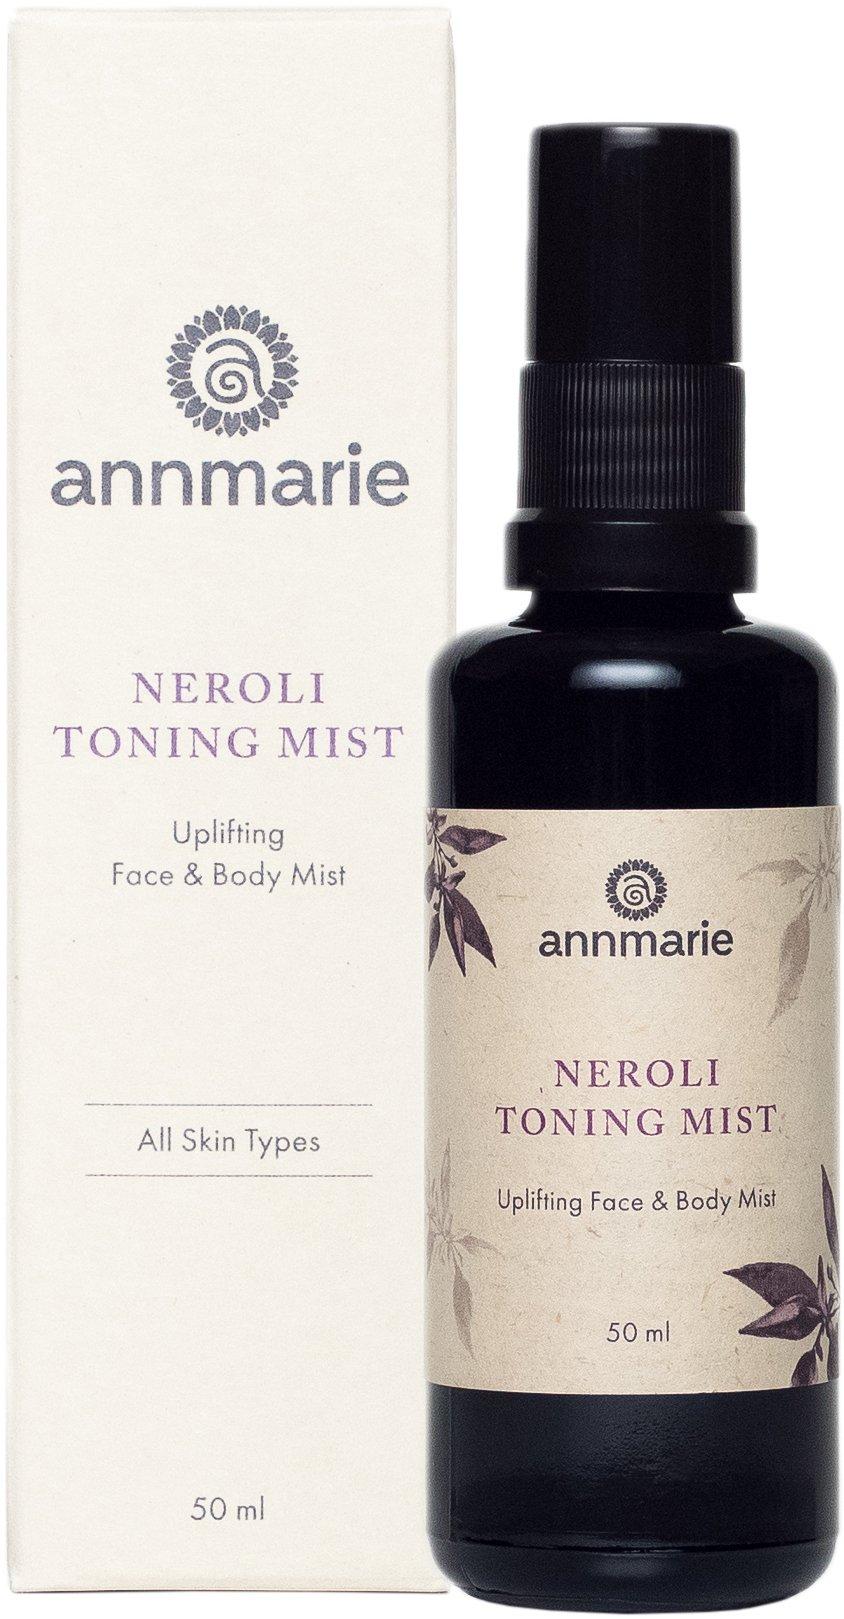 Annmarie Skin Care - Neroli Toning Mist, 50ml